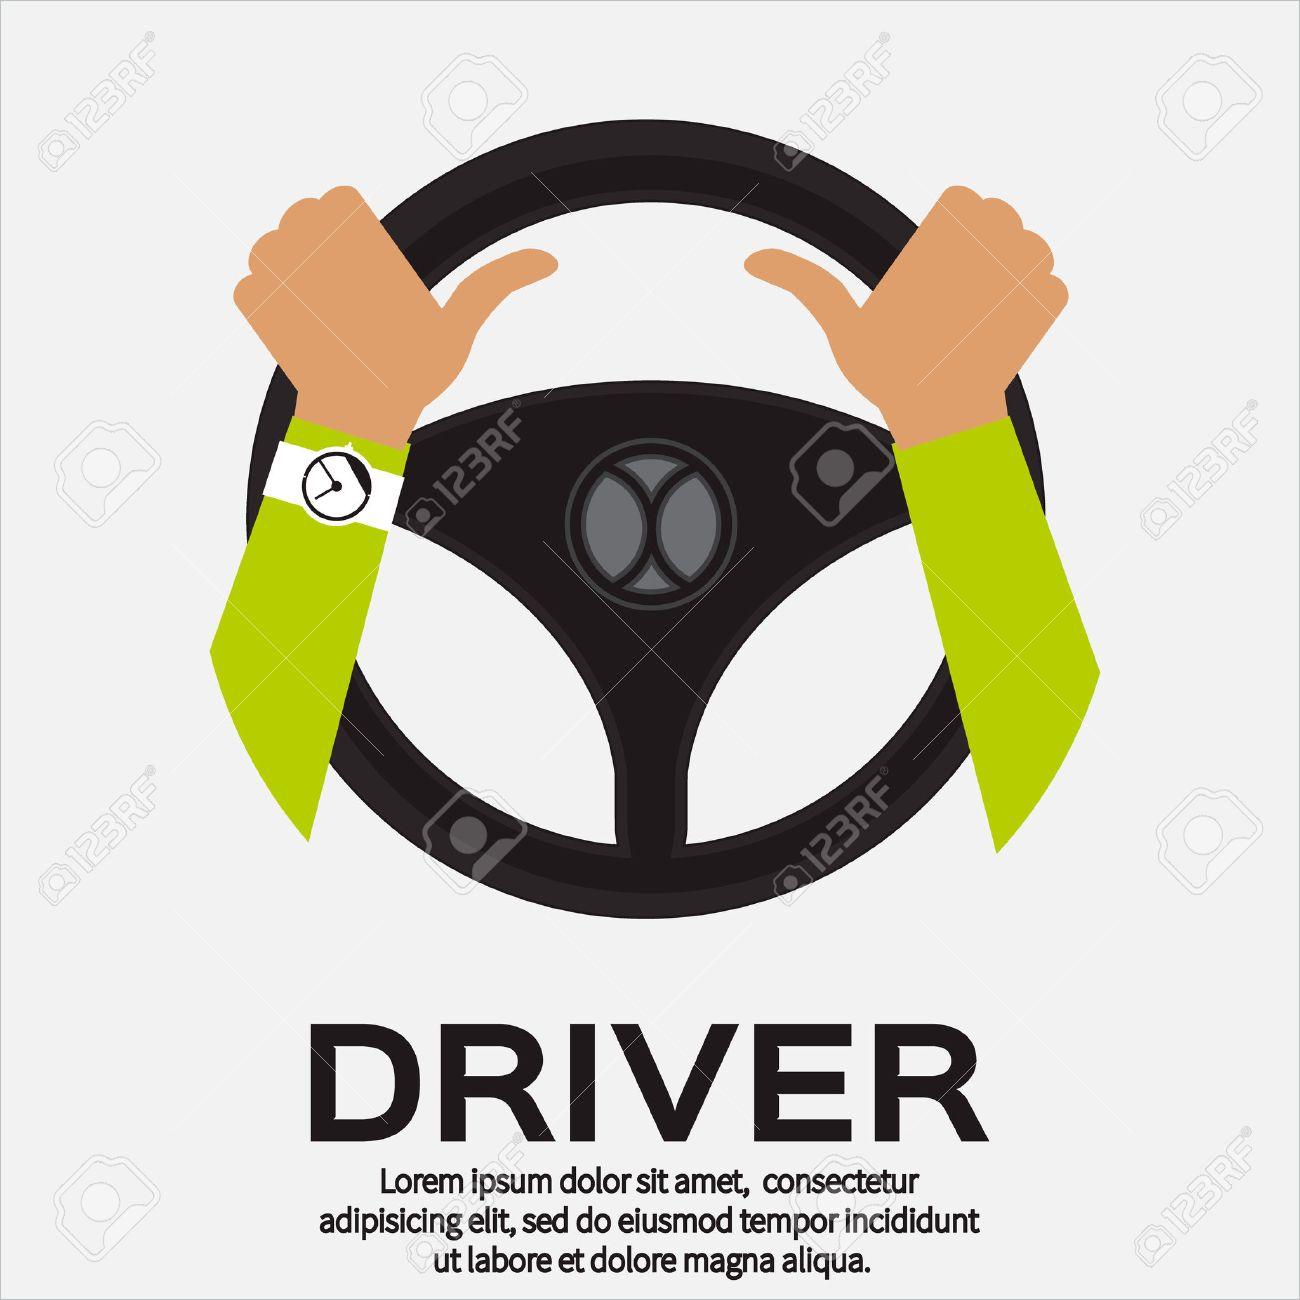 Driver design element with hands holding steering wheel. Vector illustration. - 46354430